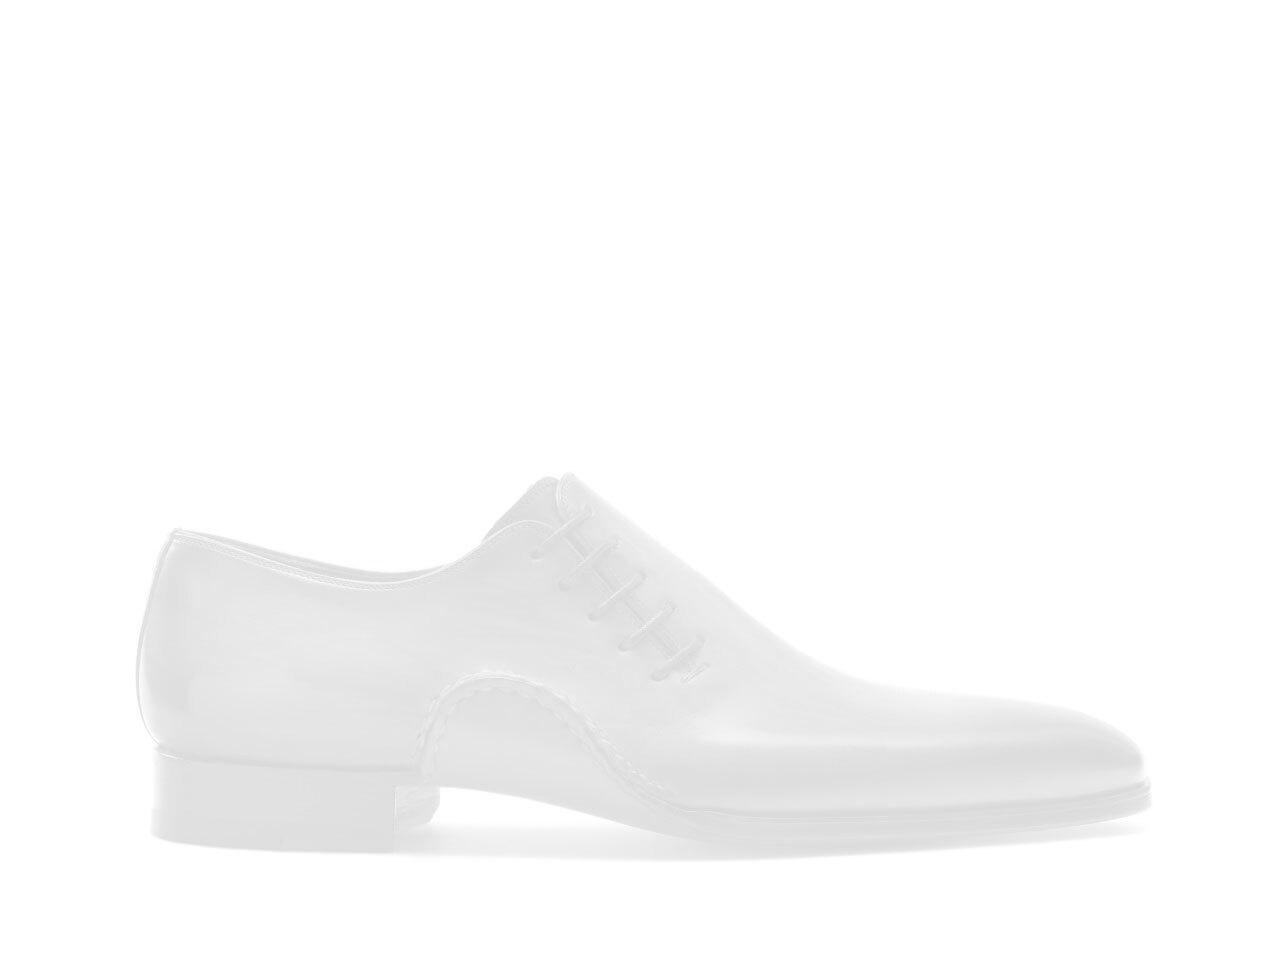 Sole of the Magnanni Jairo Navy Men's Sneakers